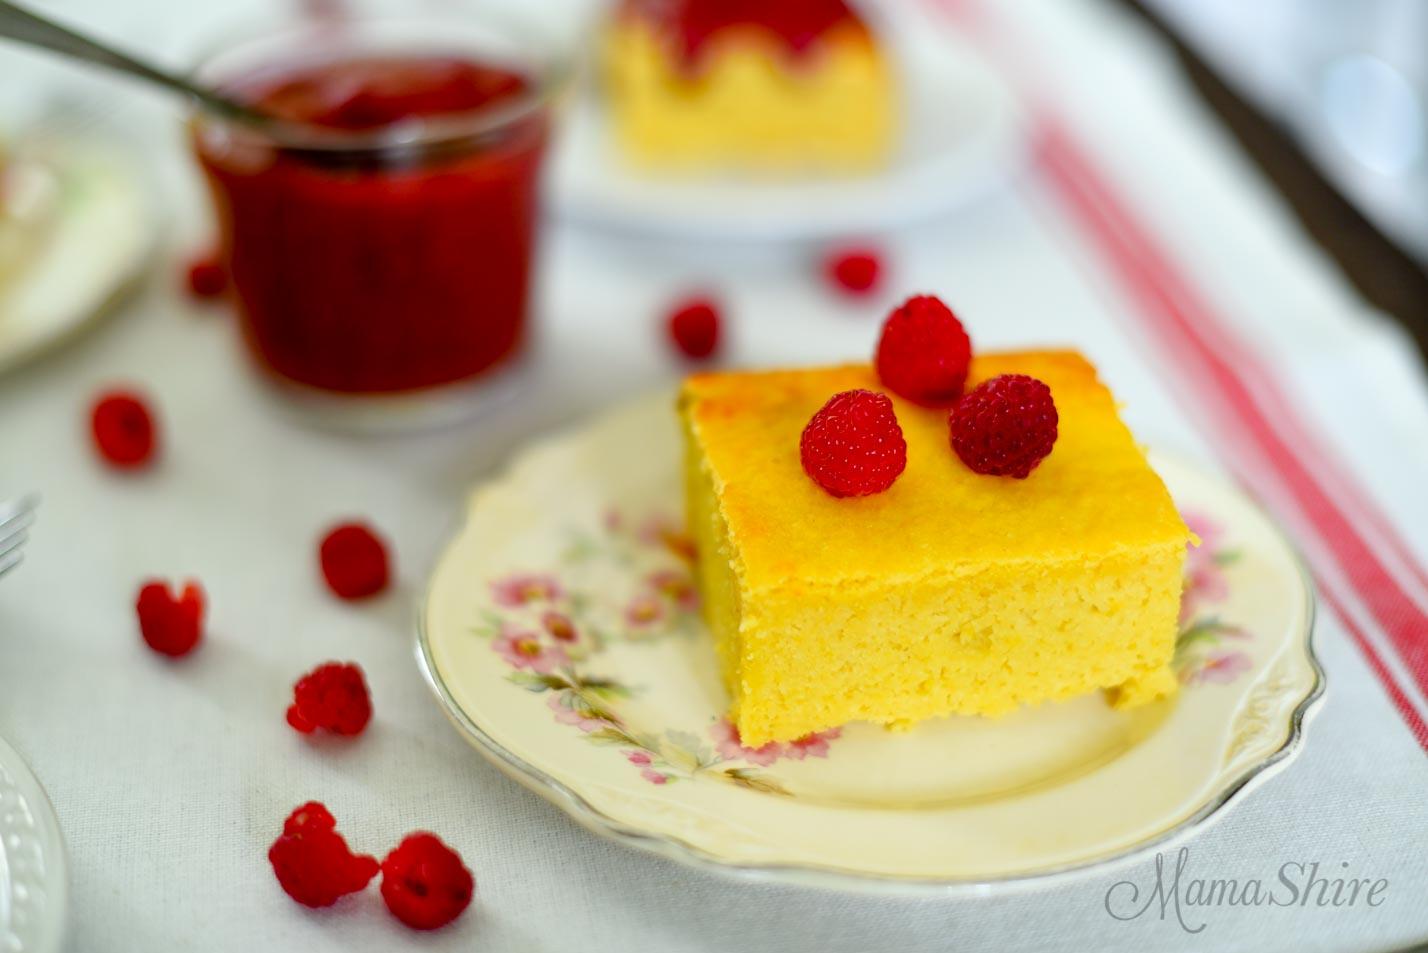 Yellow Squash Snack Cake - Tastes like a yummy pound cake. Dairy-free, Gluten-free, Sugar-free, Low-carb, THM-S